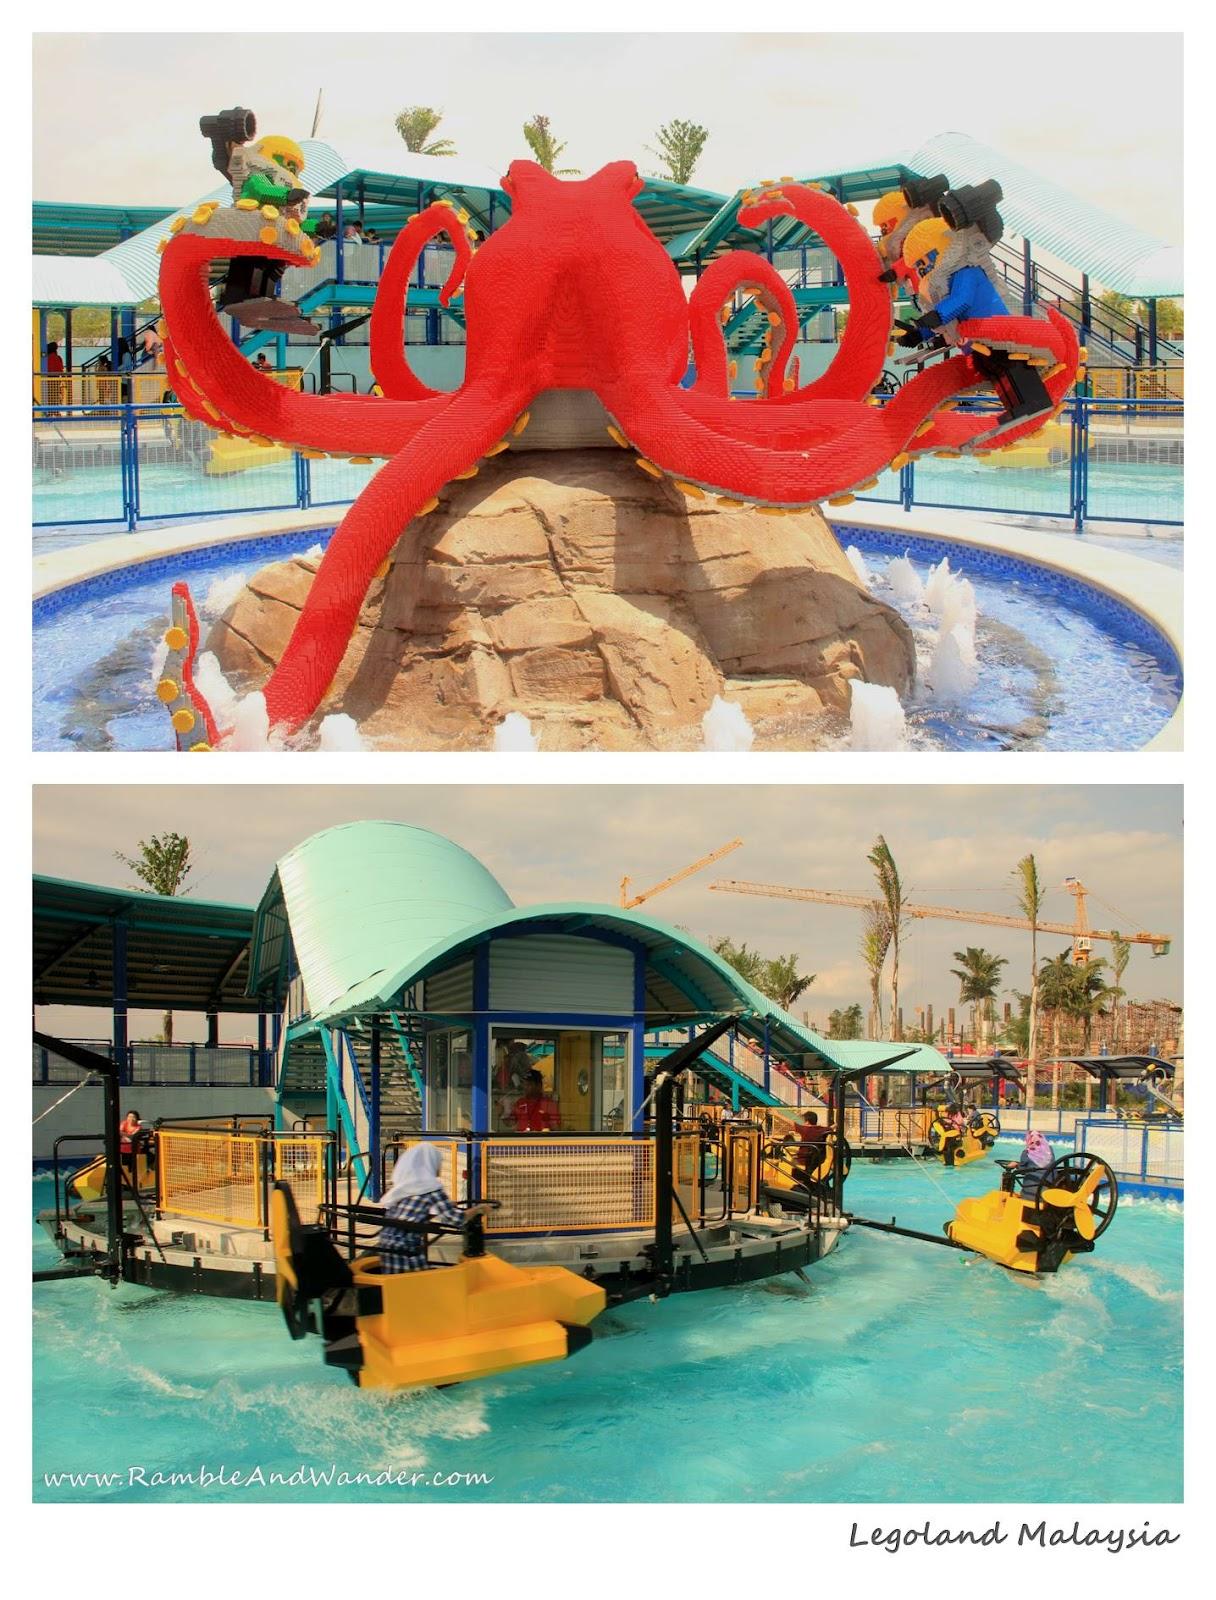 Malaysia Legoland Ramble And Wander Tiket Johor Bahru Theme Park Dan Water Click On Each Photo For A Larger Image